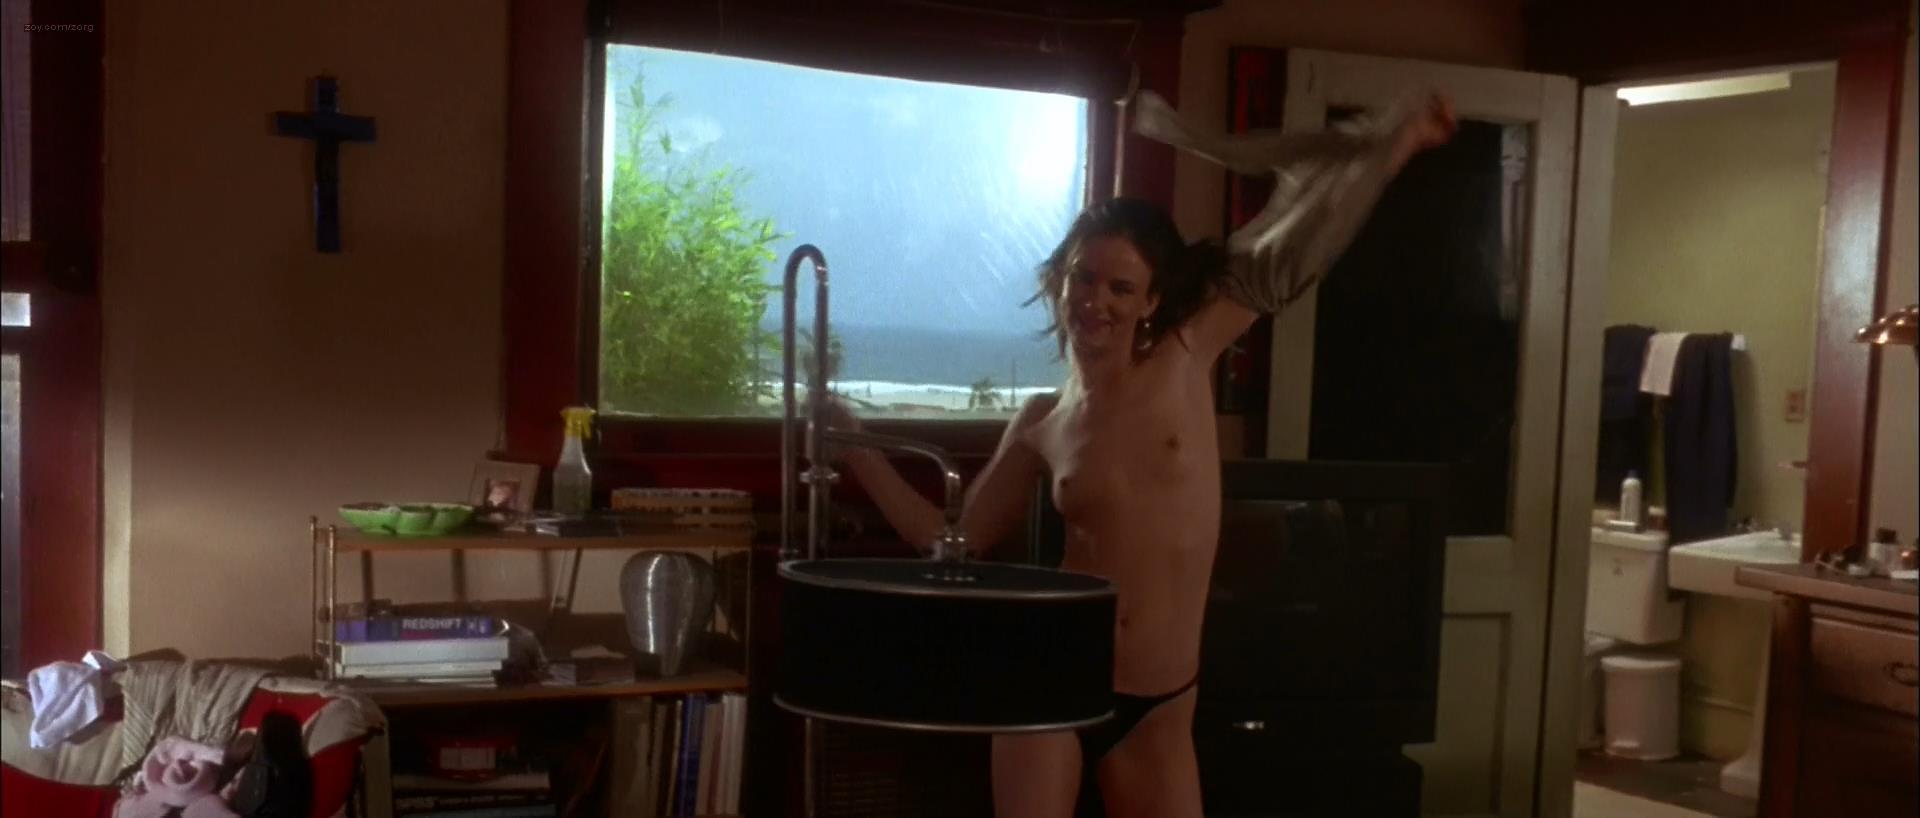 Juliette Lewis Nude Pics Pics, Sex Tape Ancensored